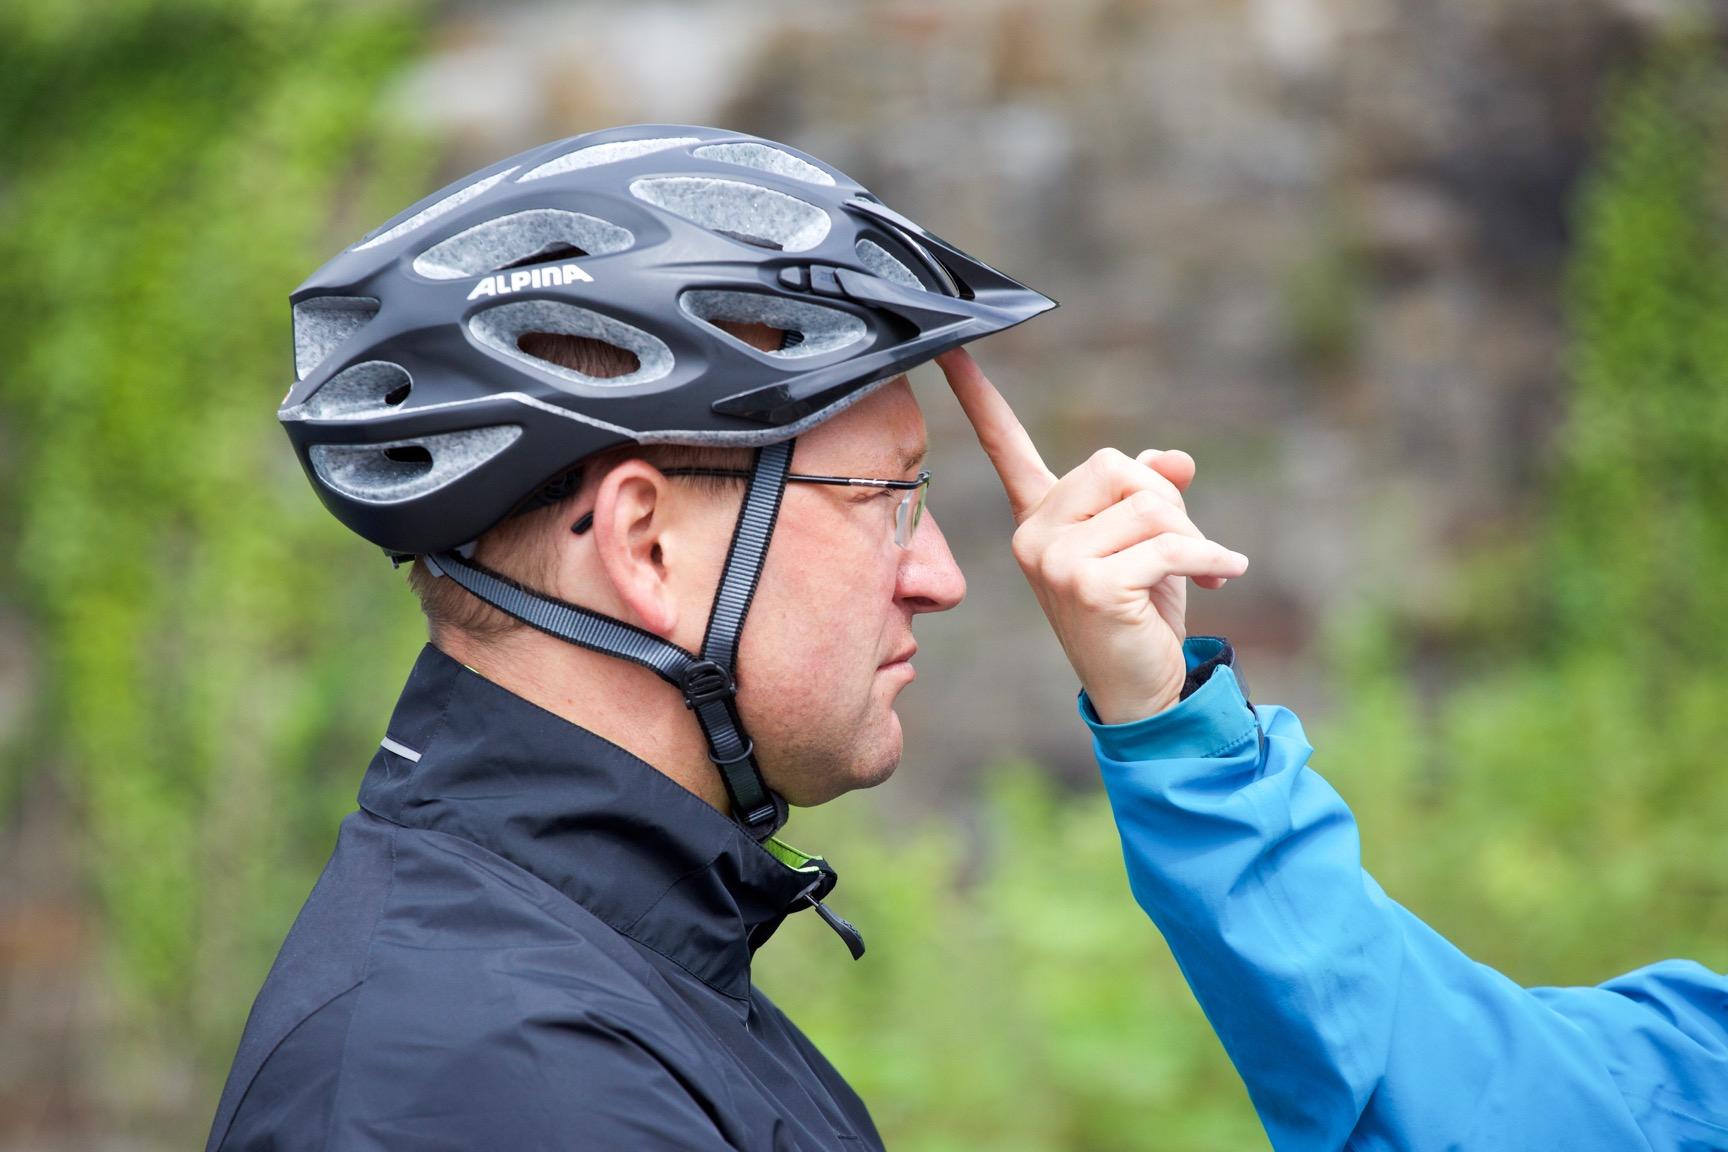 Helm Check